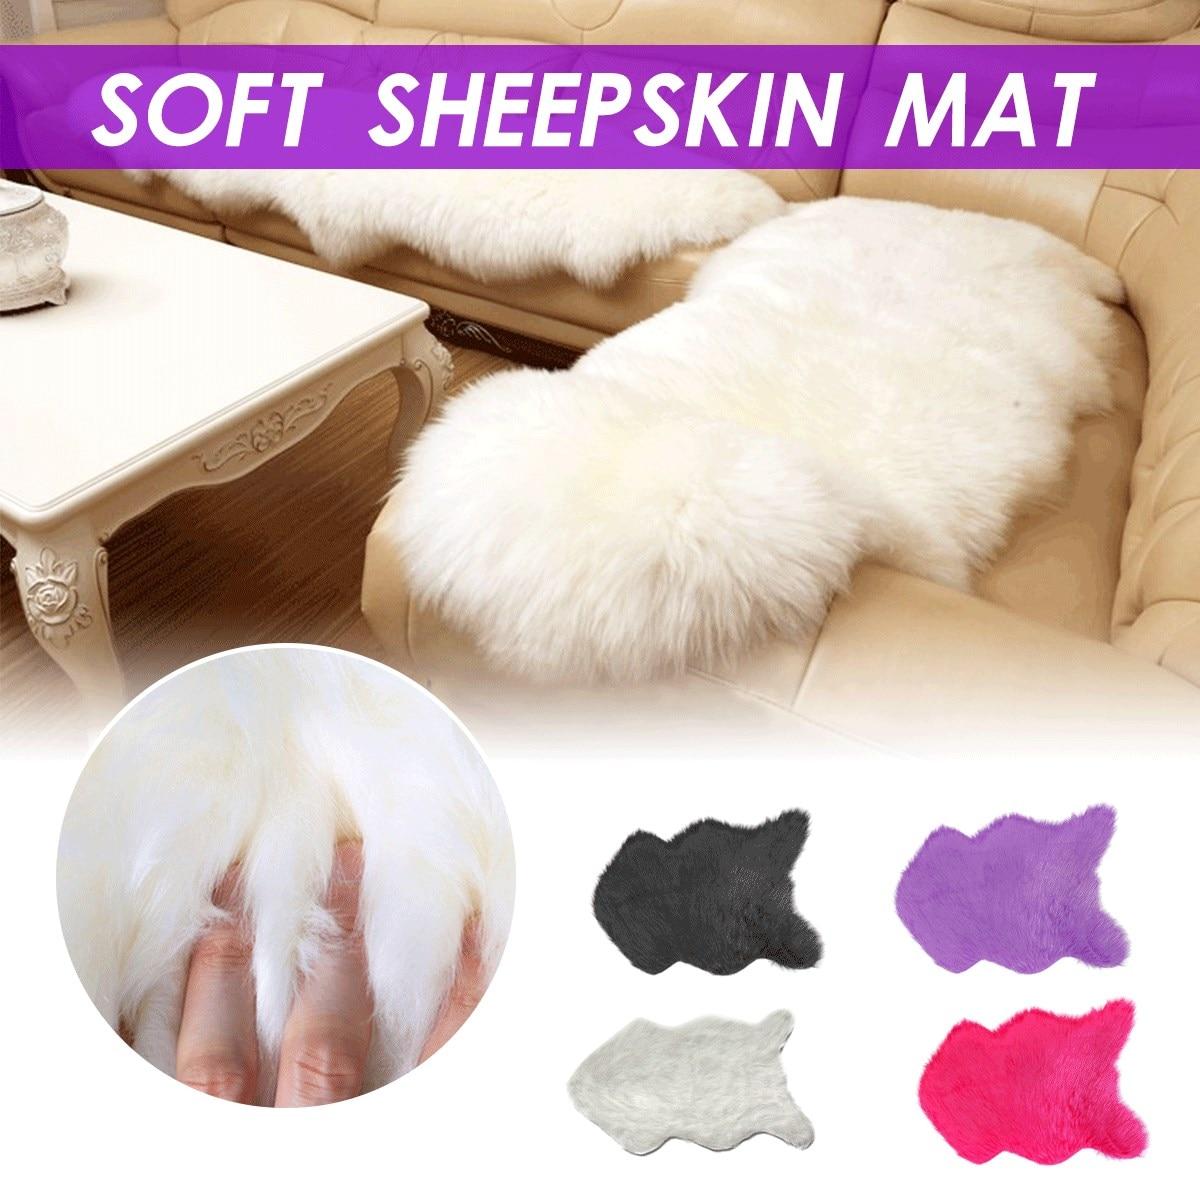 Soft Artificial Sheepskin Carpet For Living Room Kids Bedroom Chair Cover Fluffy Hairy Anti-Slip Faux Fur Rug Floor Mat